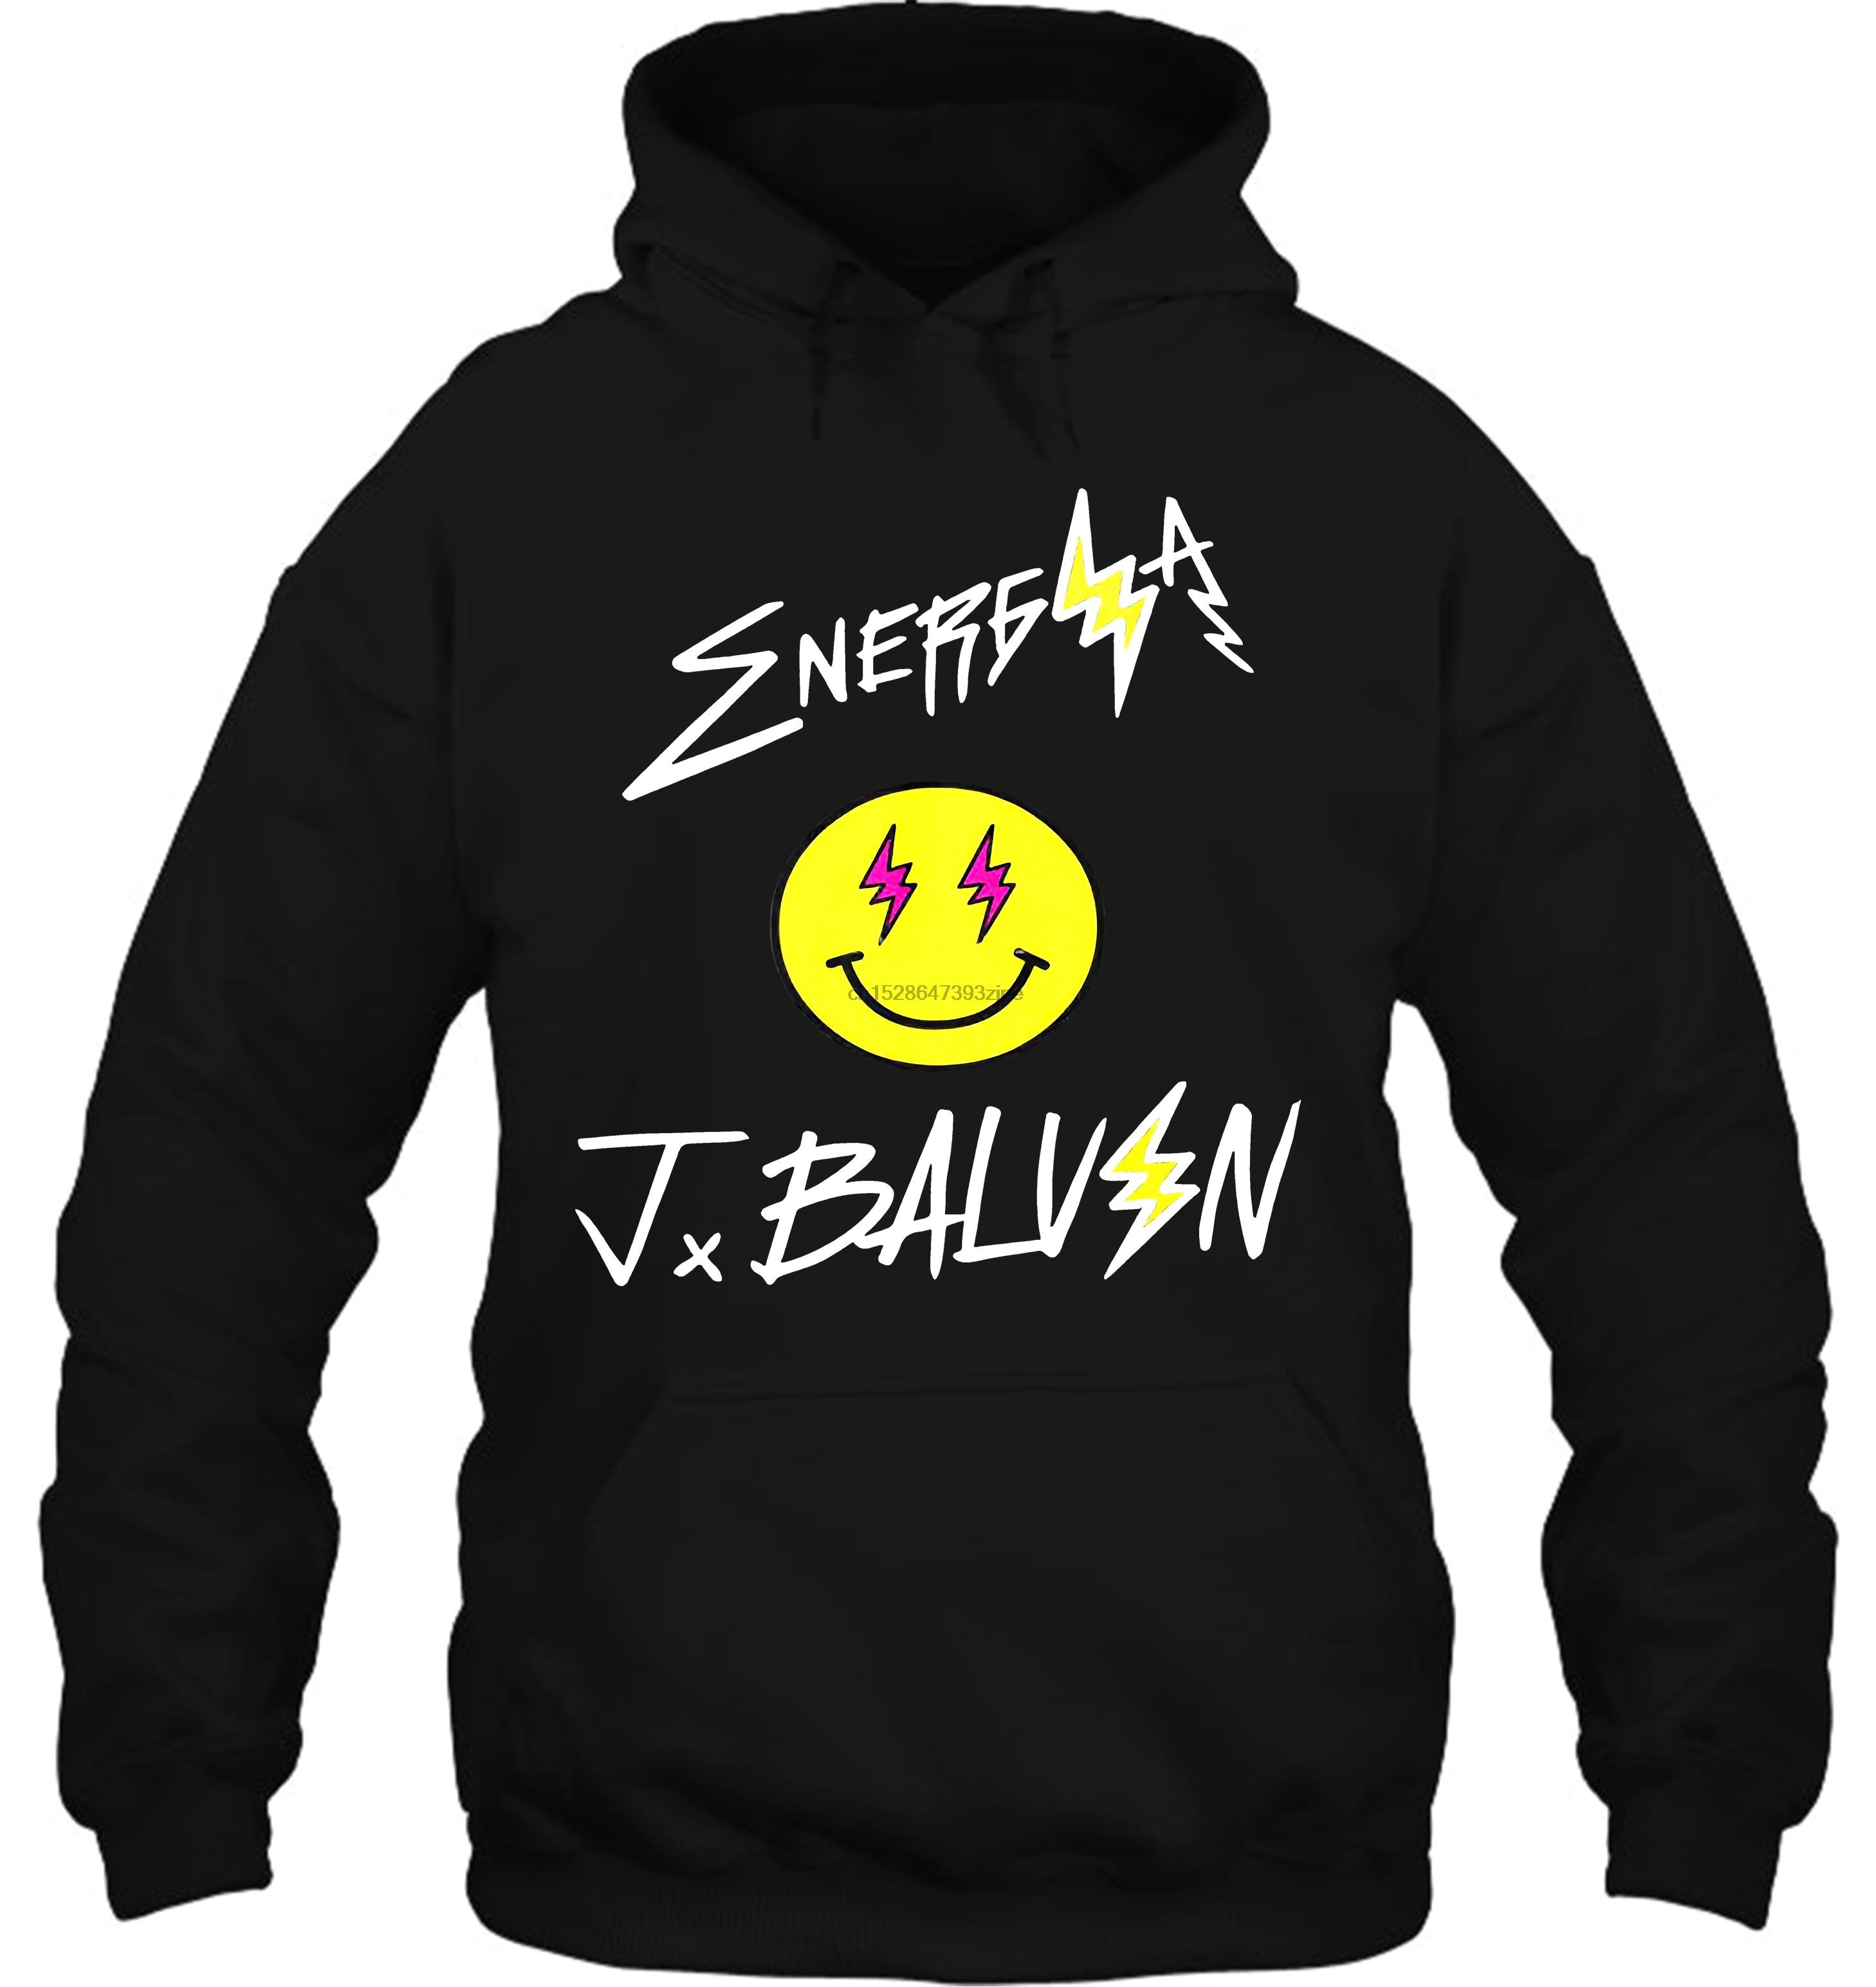 Design J Balvin Energia Reggaeton Broadcloth Crew Neck For Men Men Women Streetwear Hoodies Sweatshirts